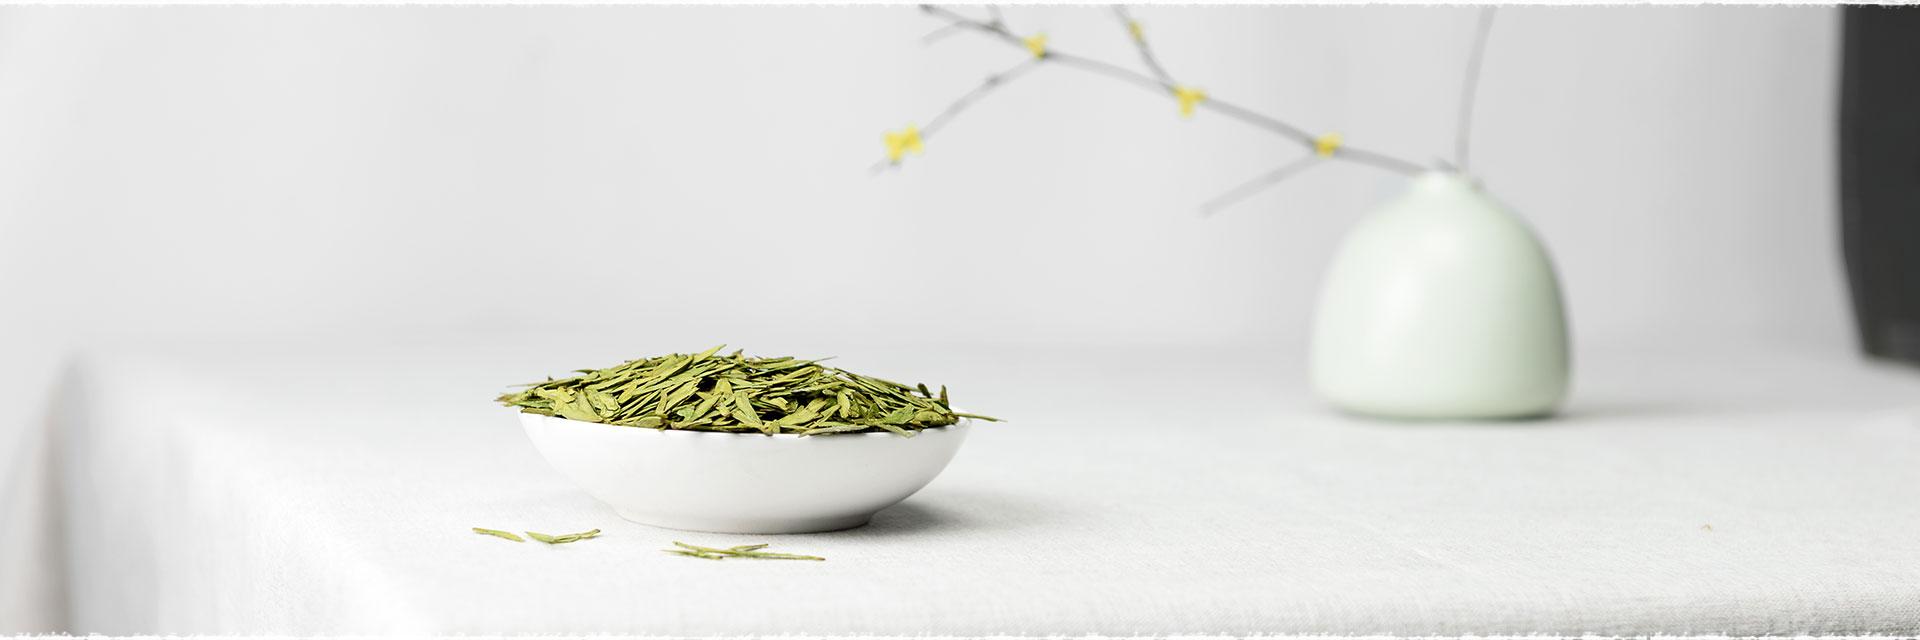 LonJing MingQian ou Puits du dragon, quel thé vert de printemps choisir ?